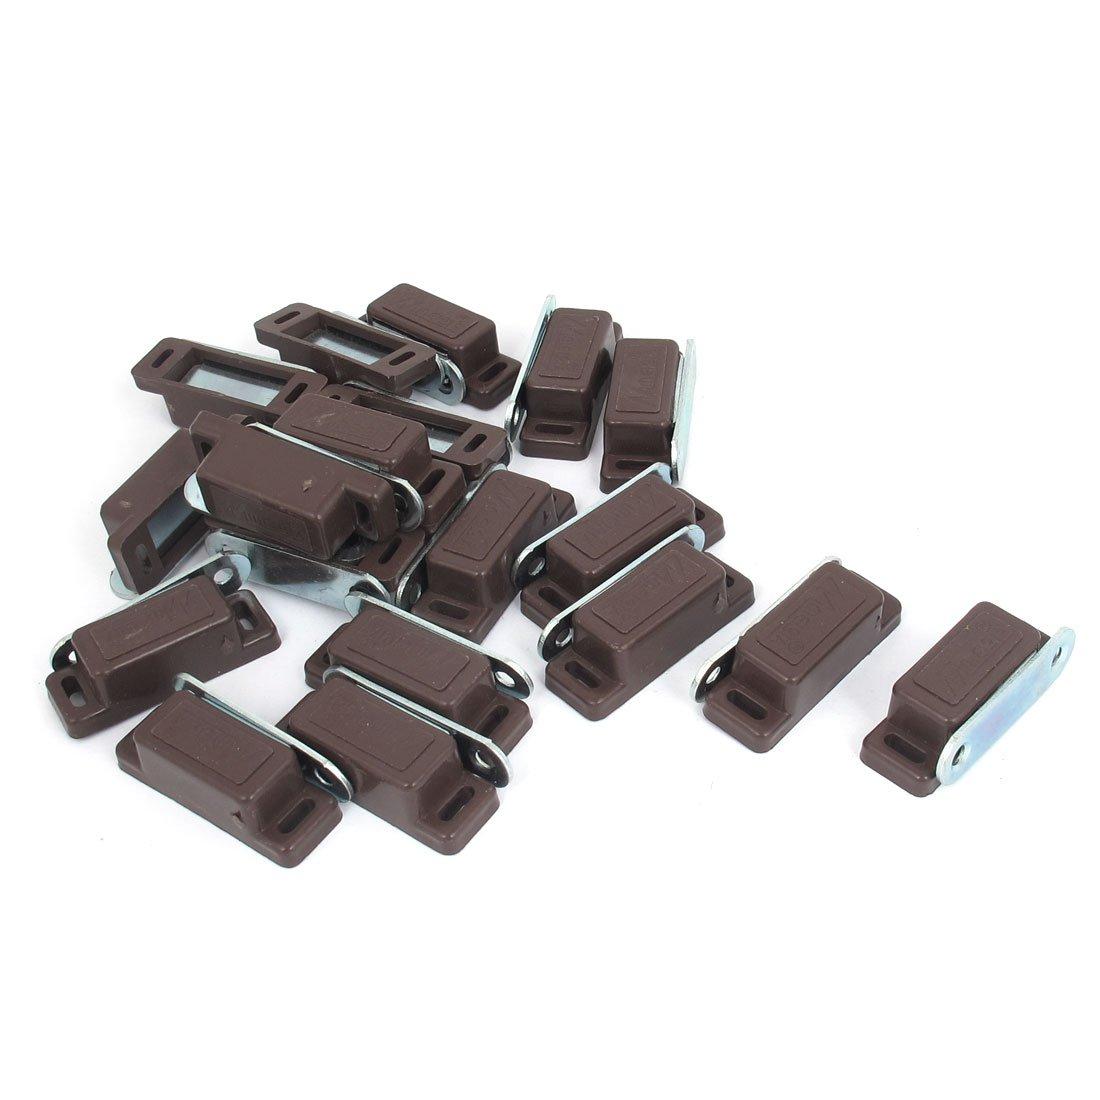 Cabinet Door 46mm Length Plastic Magnetic Catch Latch Brown 20pcs